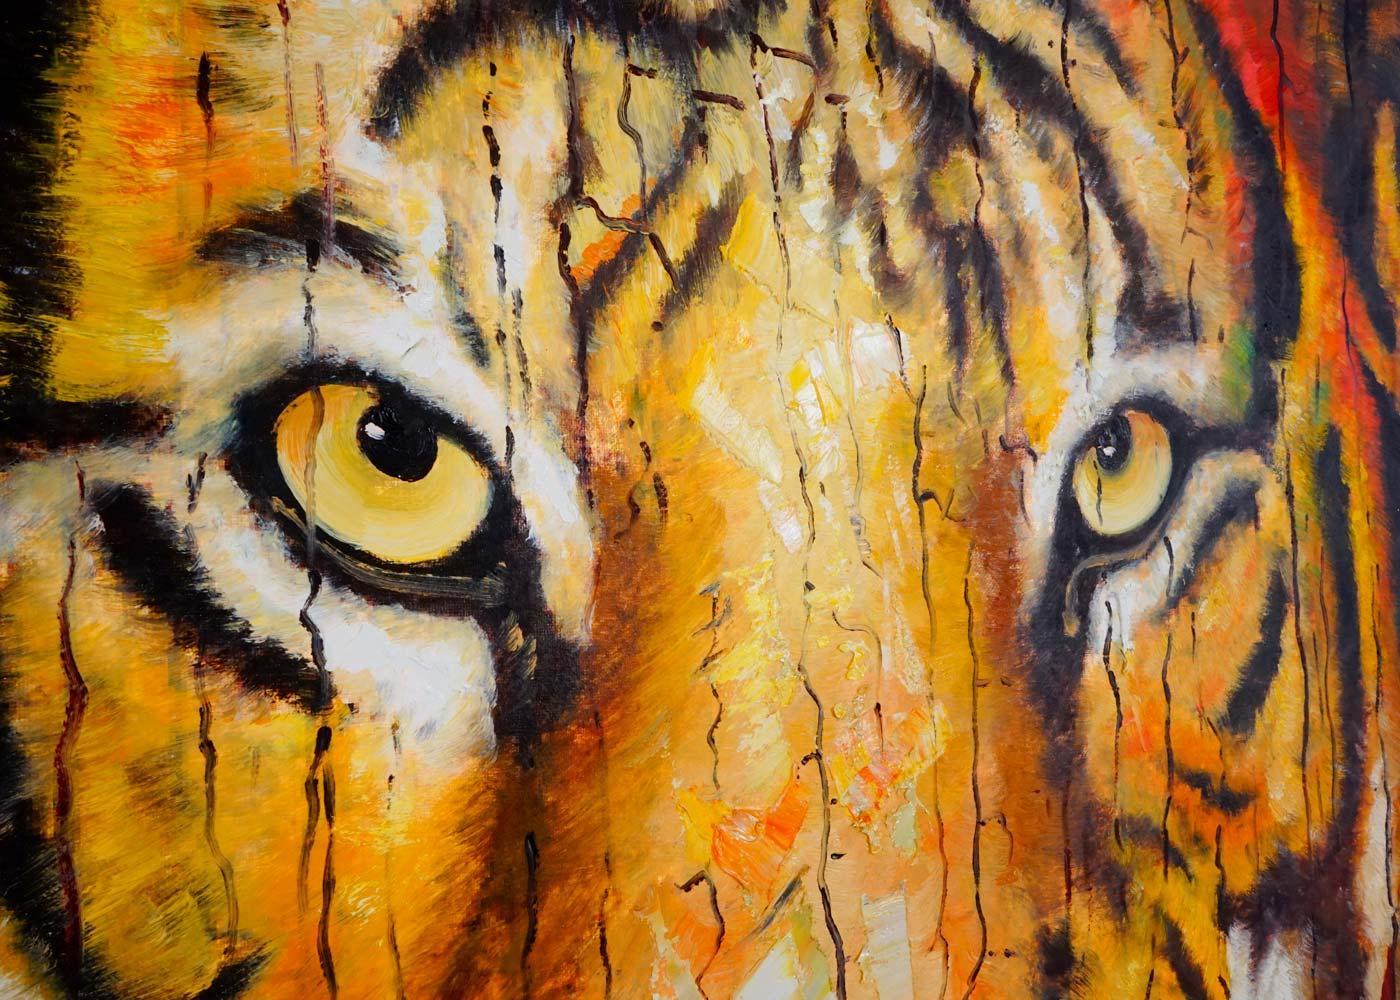 Cuadro Al óleo Tigre Pintado A Mano 100x90 Cm